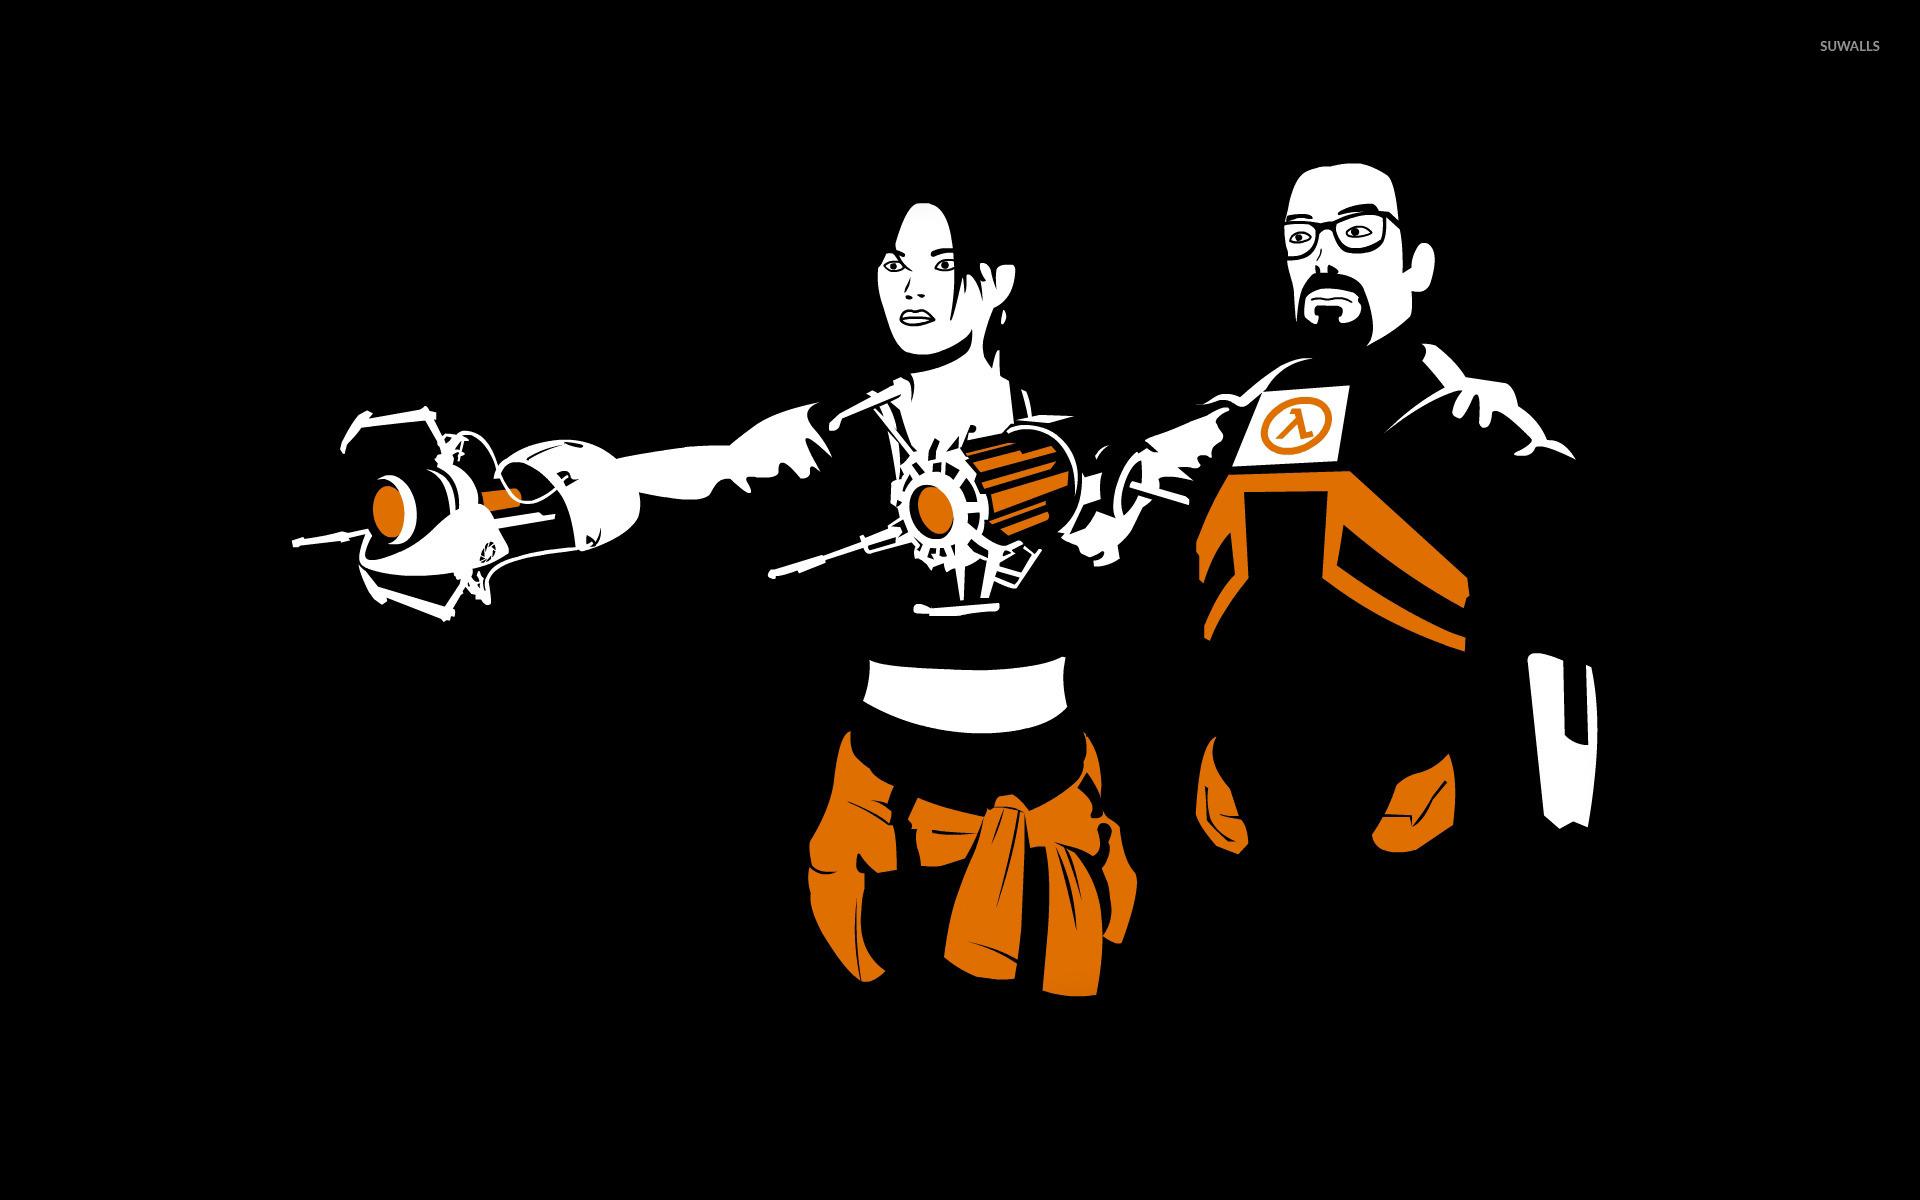 alyx vance and gordon freeman - half-life 2 wallpaper - game